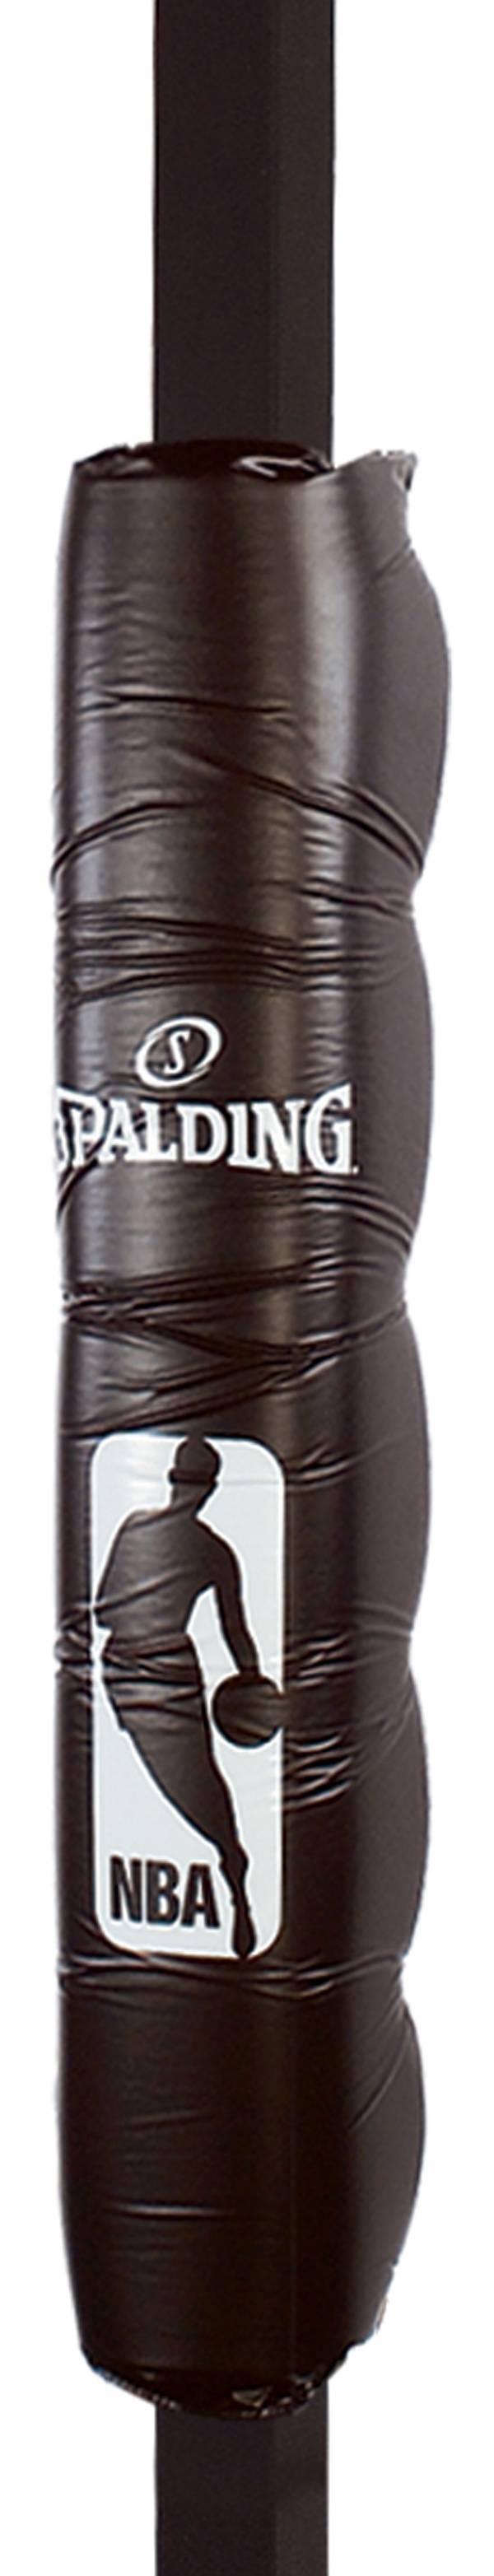 Spalding Premium Heavy Duty Pole Pad product image